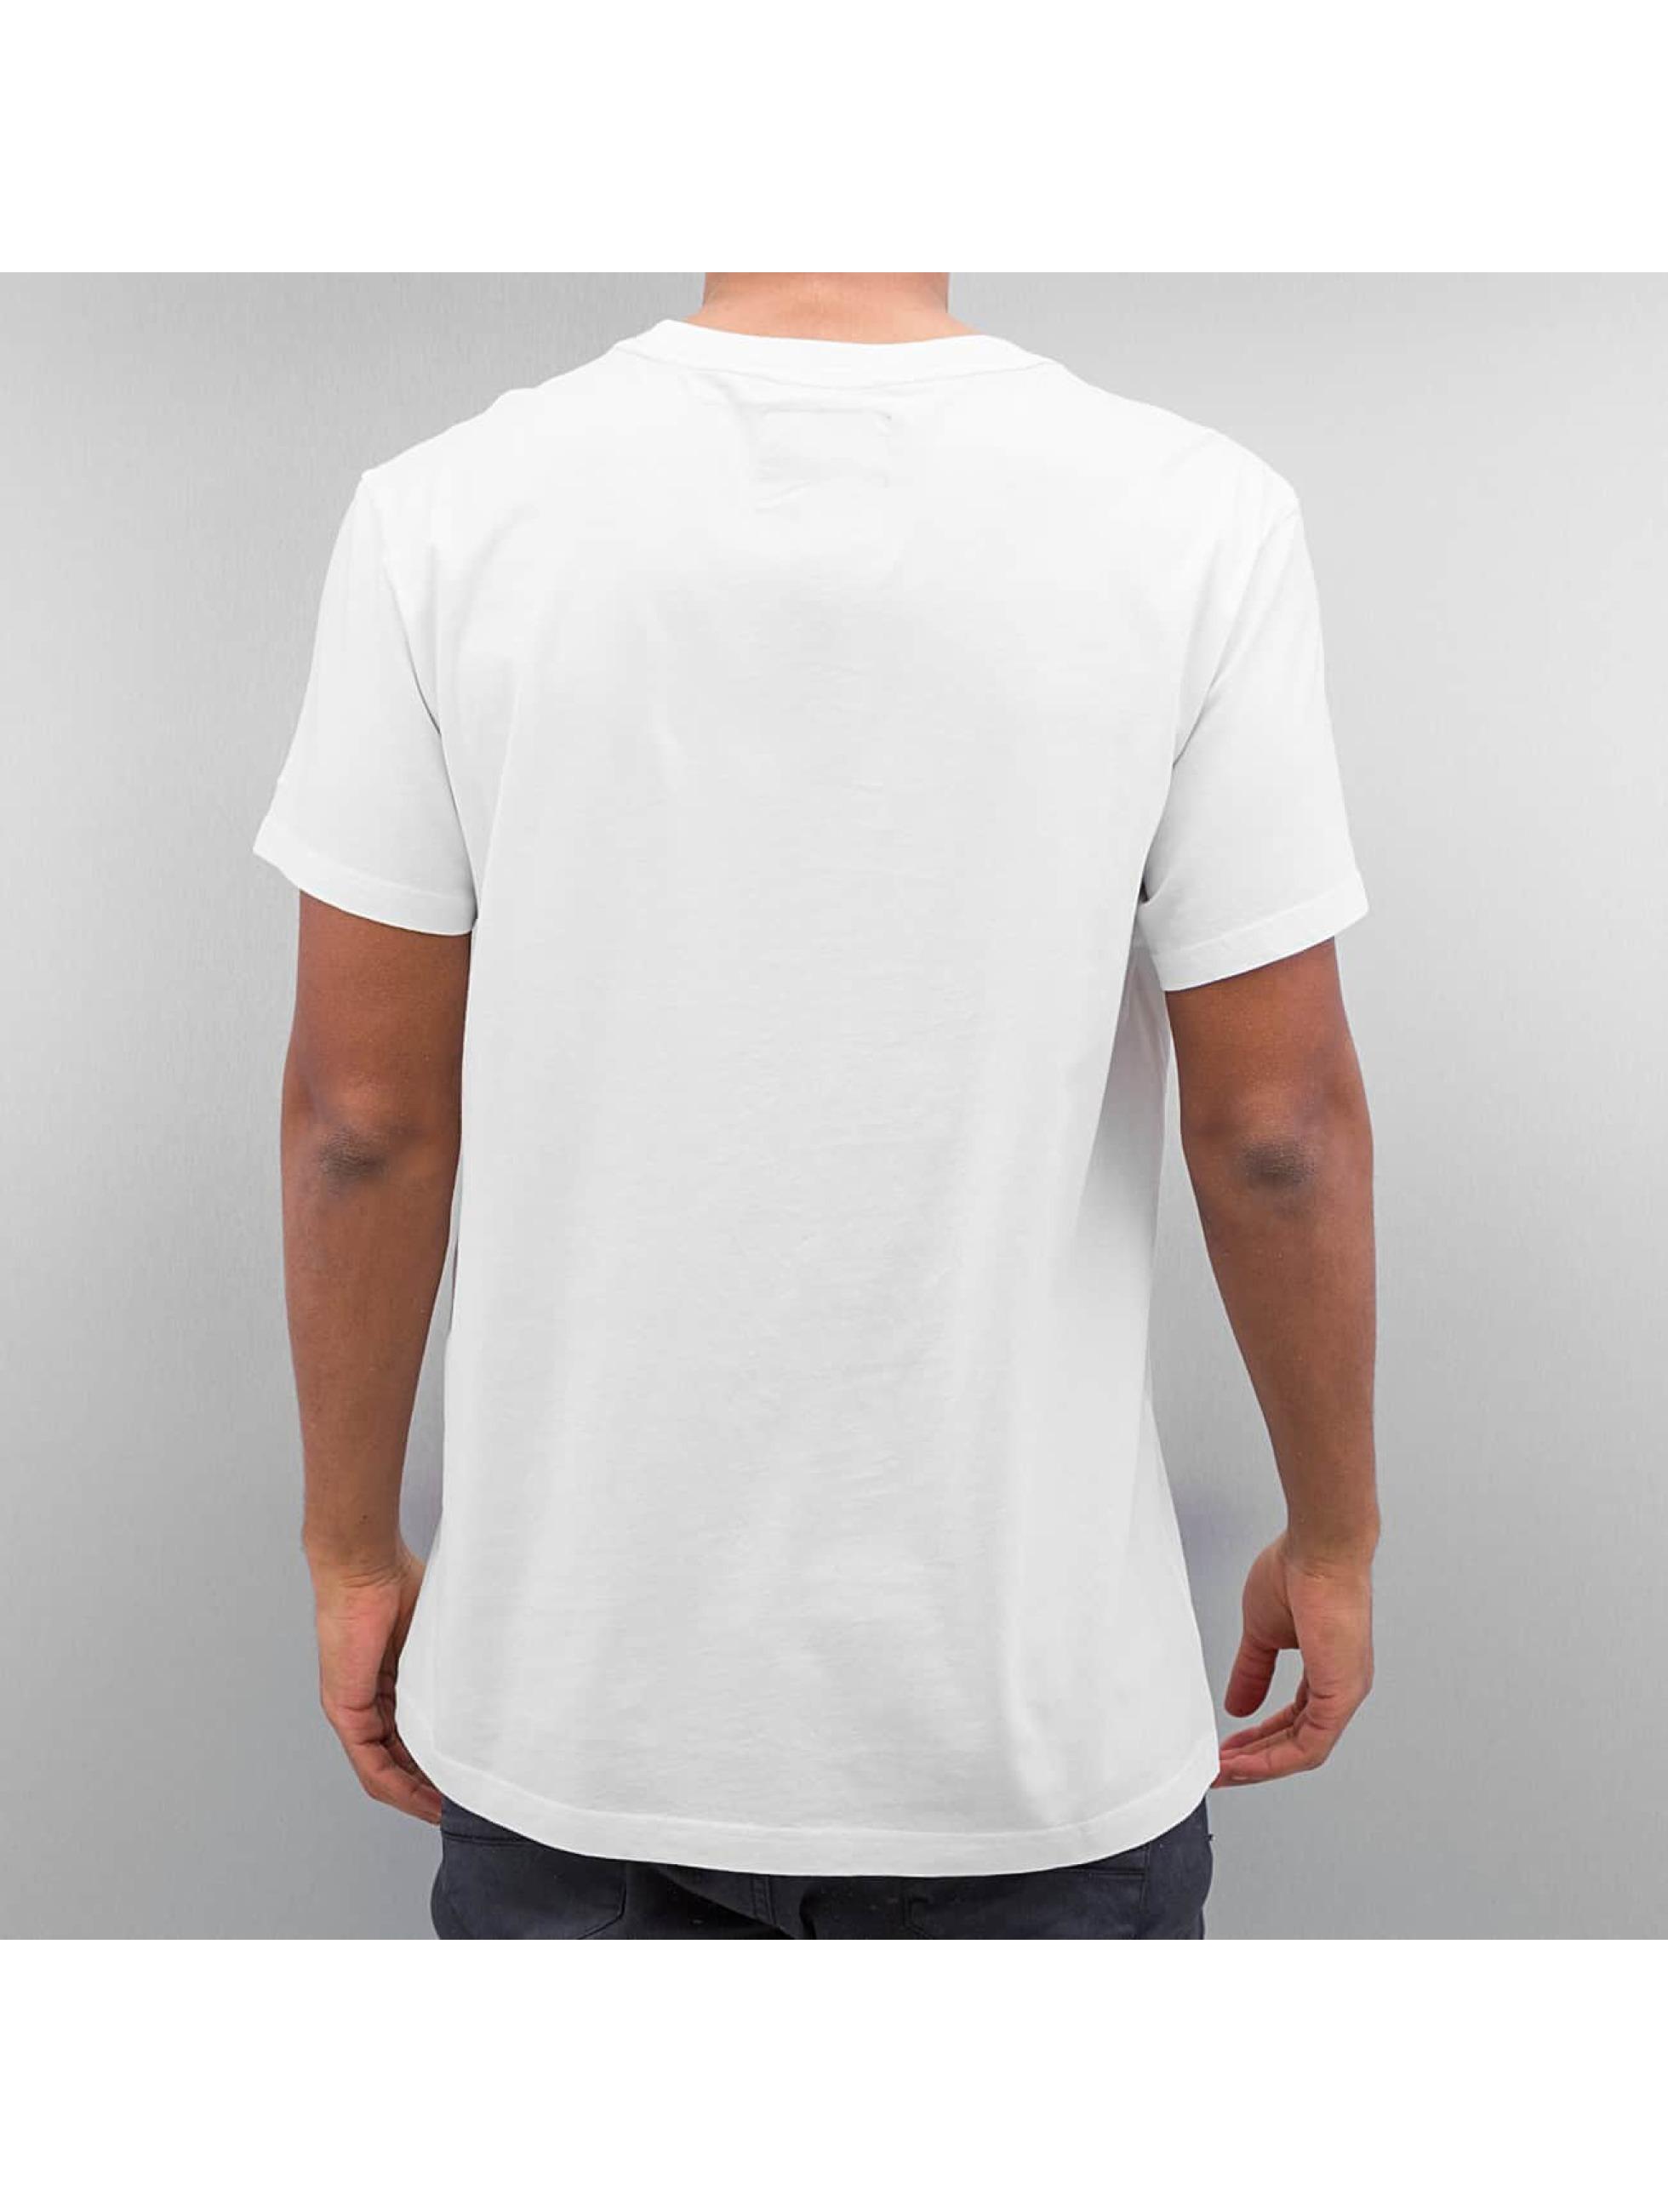 G-Star Футболка Ratiz Pocket Compact белый